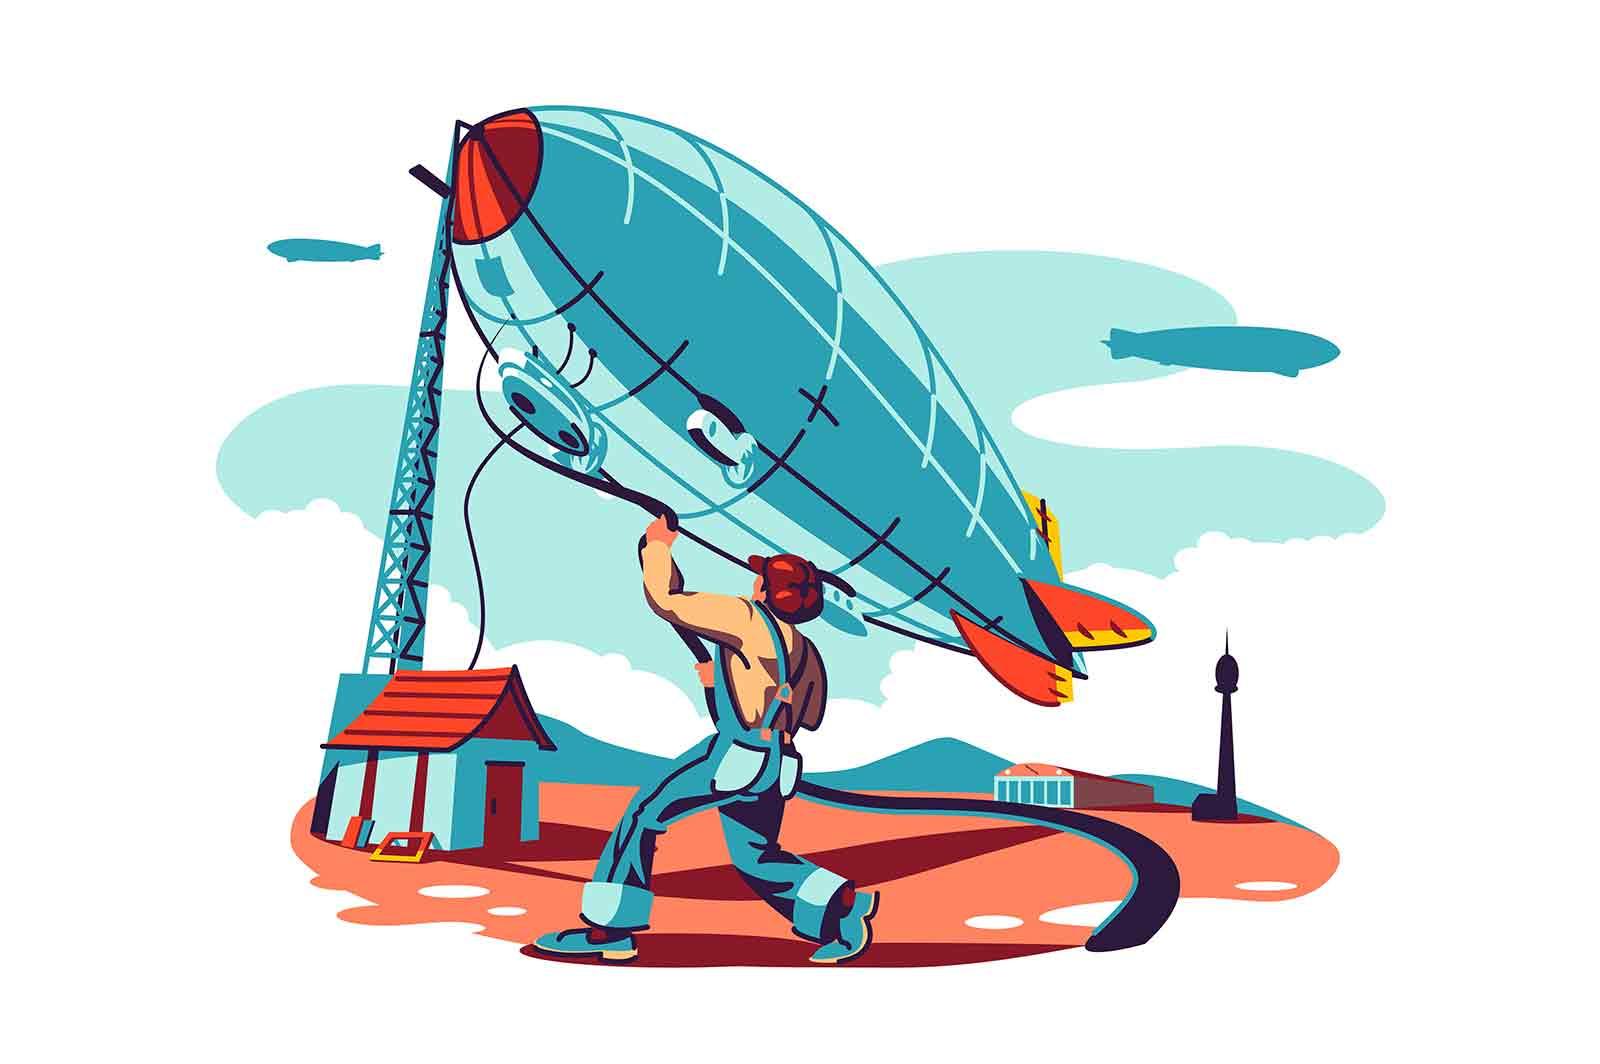 Man trying controls airship vector illustration. Dirigible flying in sky. Retro zeppelin flight flat style concept. Aeronautics technology idea